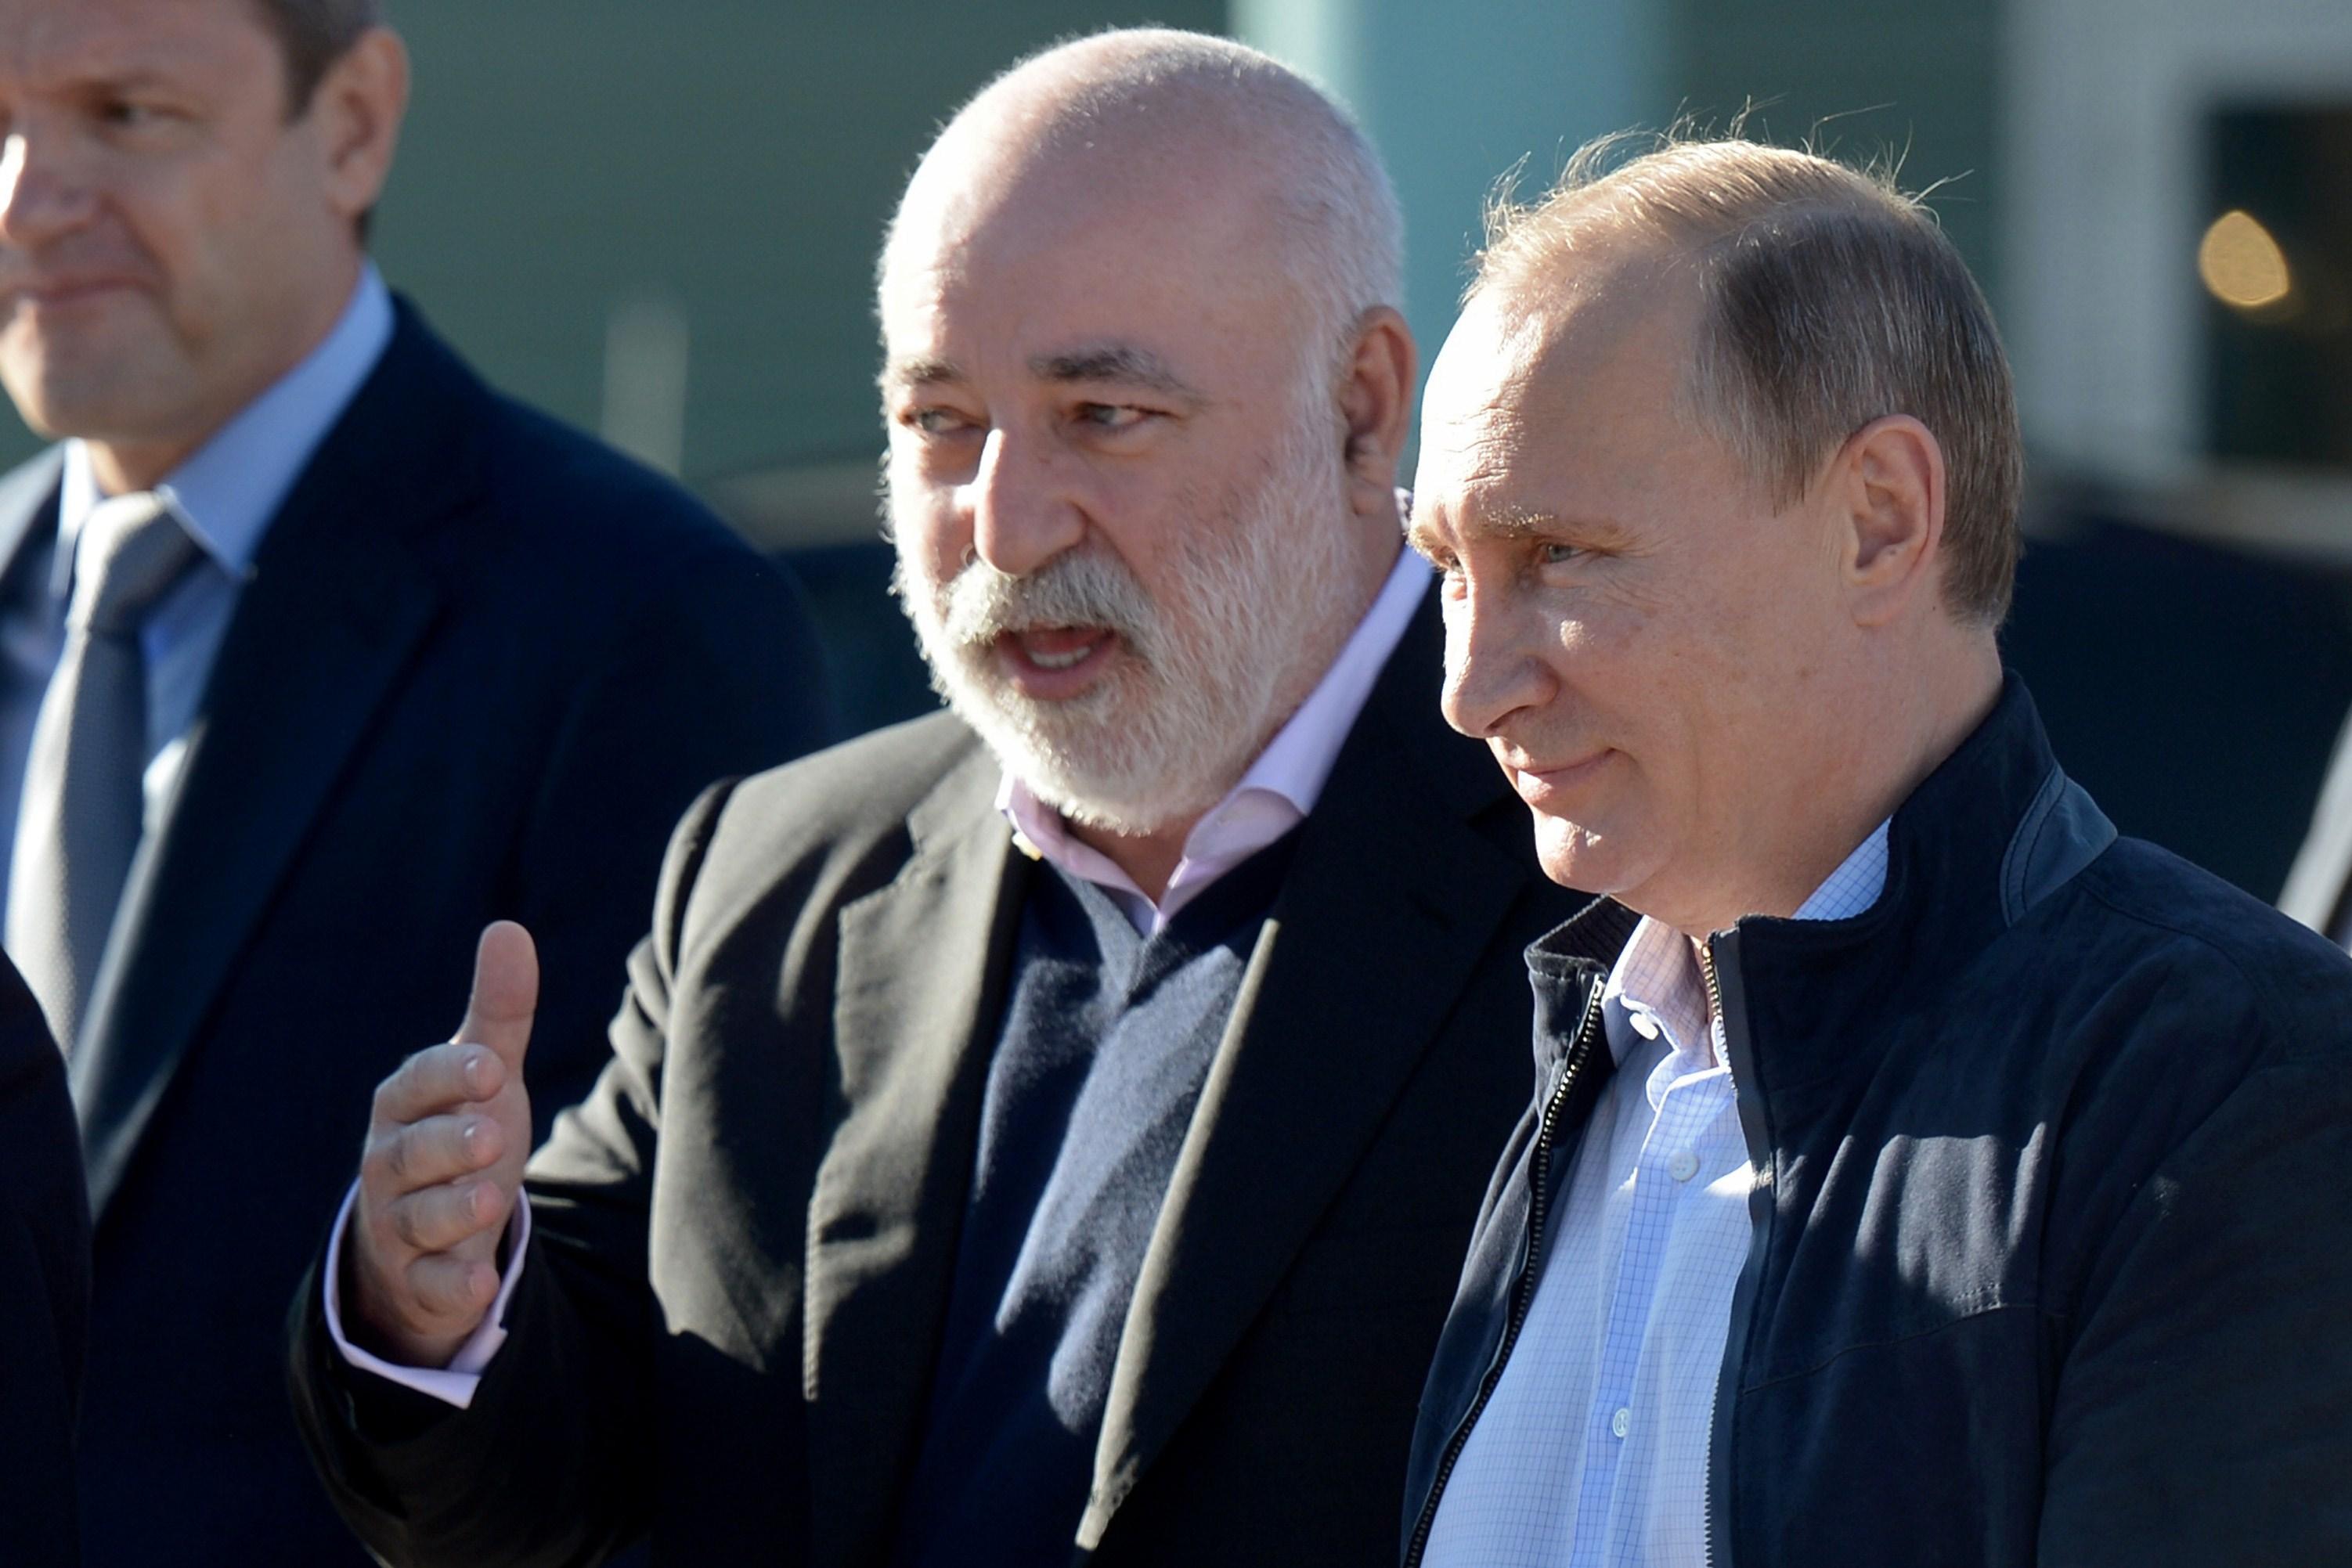 Russian President Vladimir Putin (R) speaks with Skolkovo Foundation President Viktor Vekselberg in 2014. (Getty)